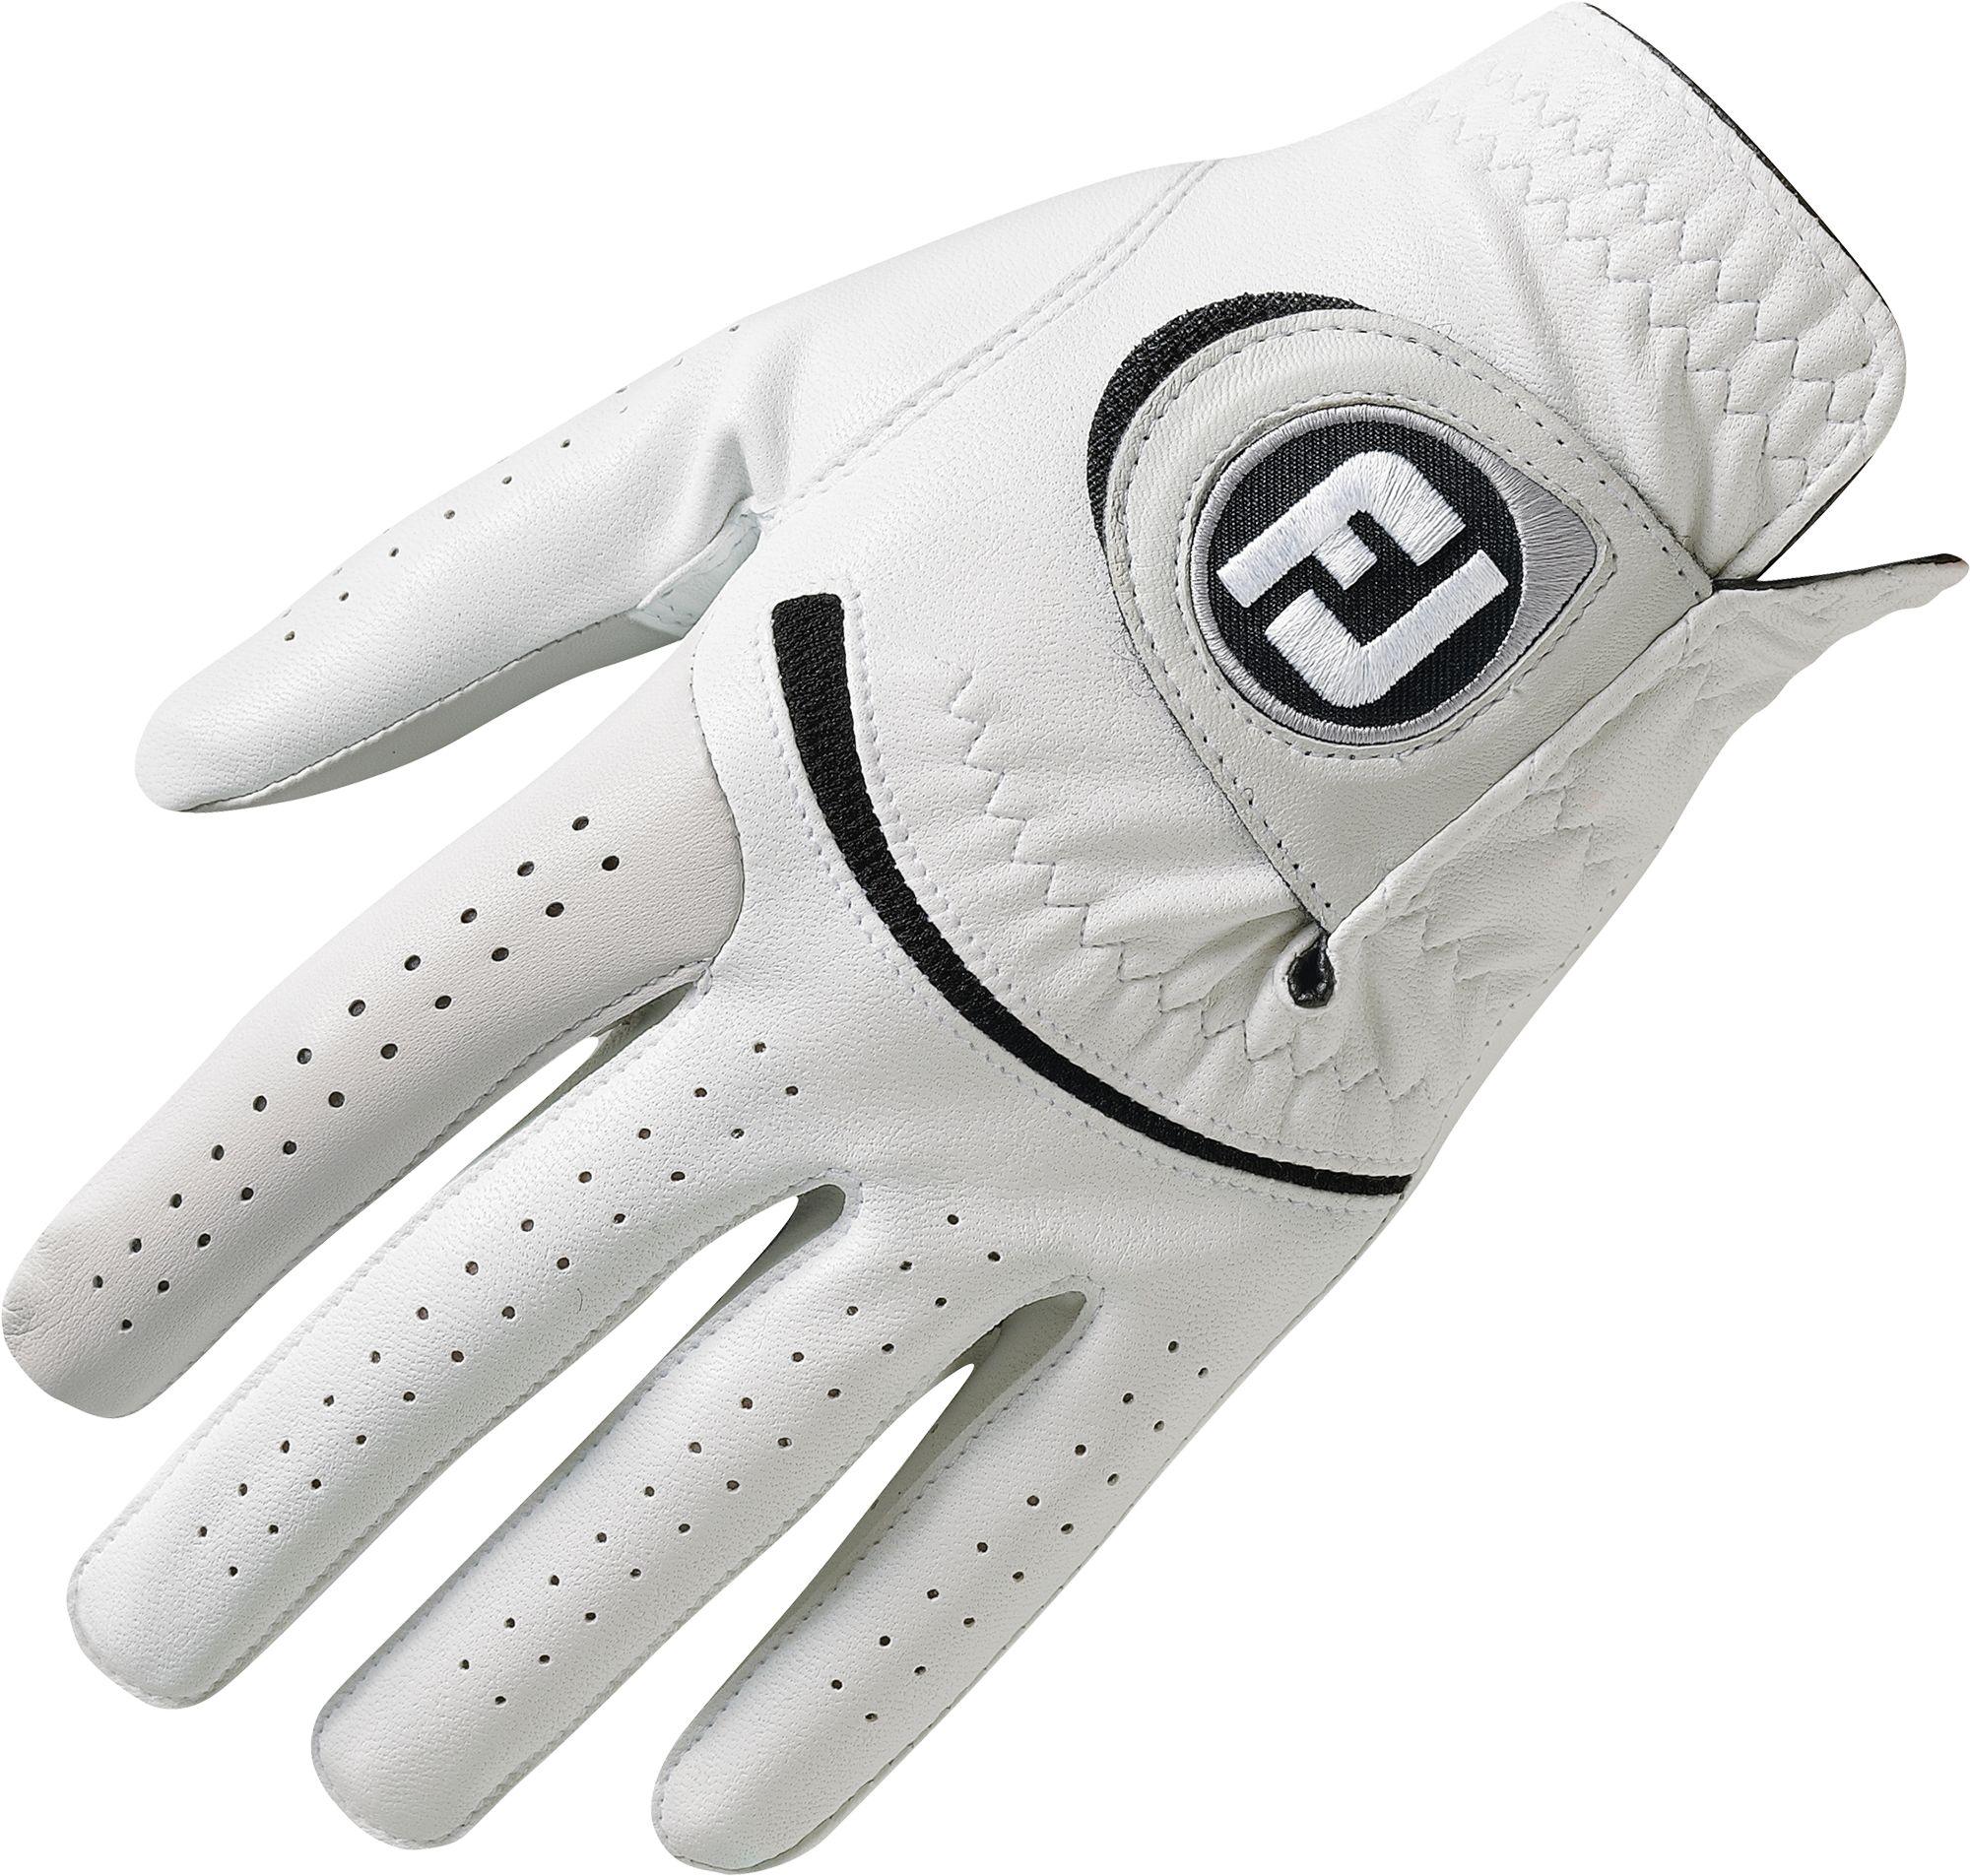 Mens gloves cadet - Product Image Footjoy Women S Sofjoy Golf Glove